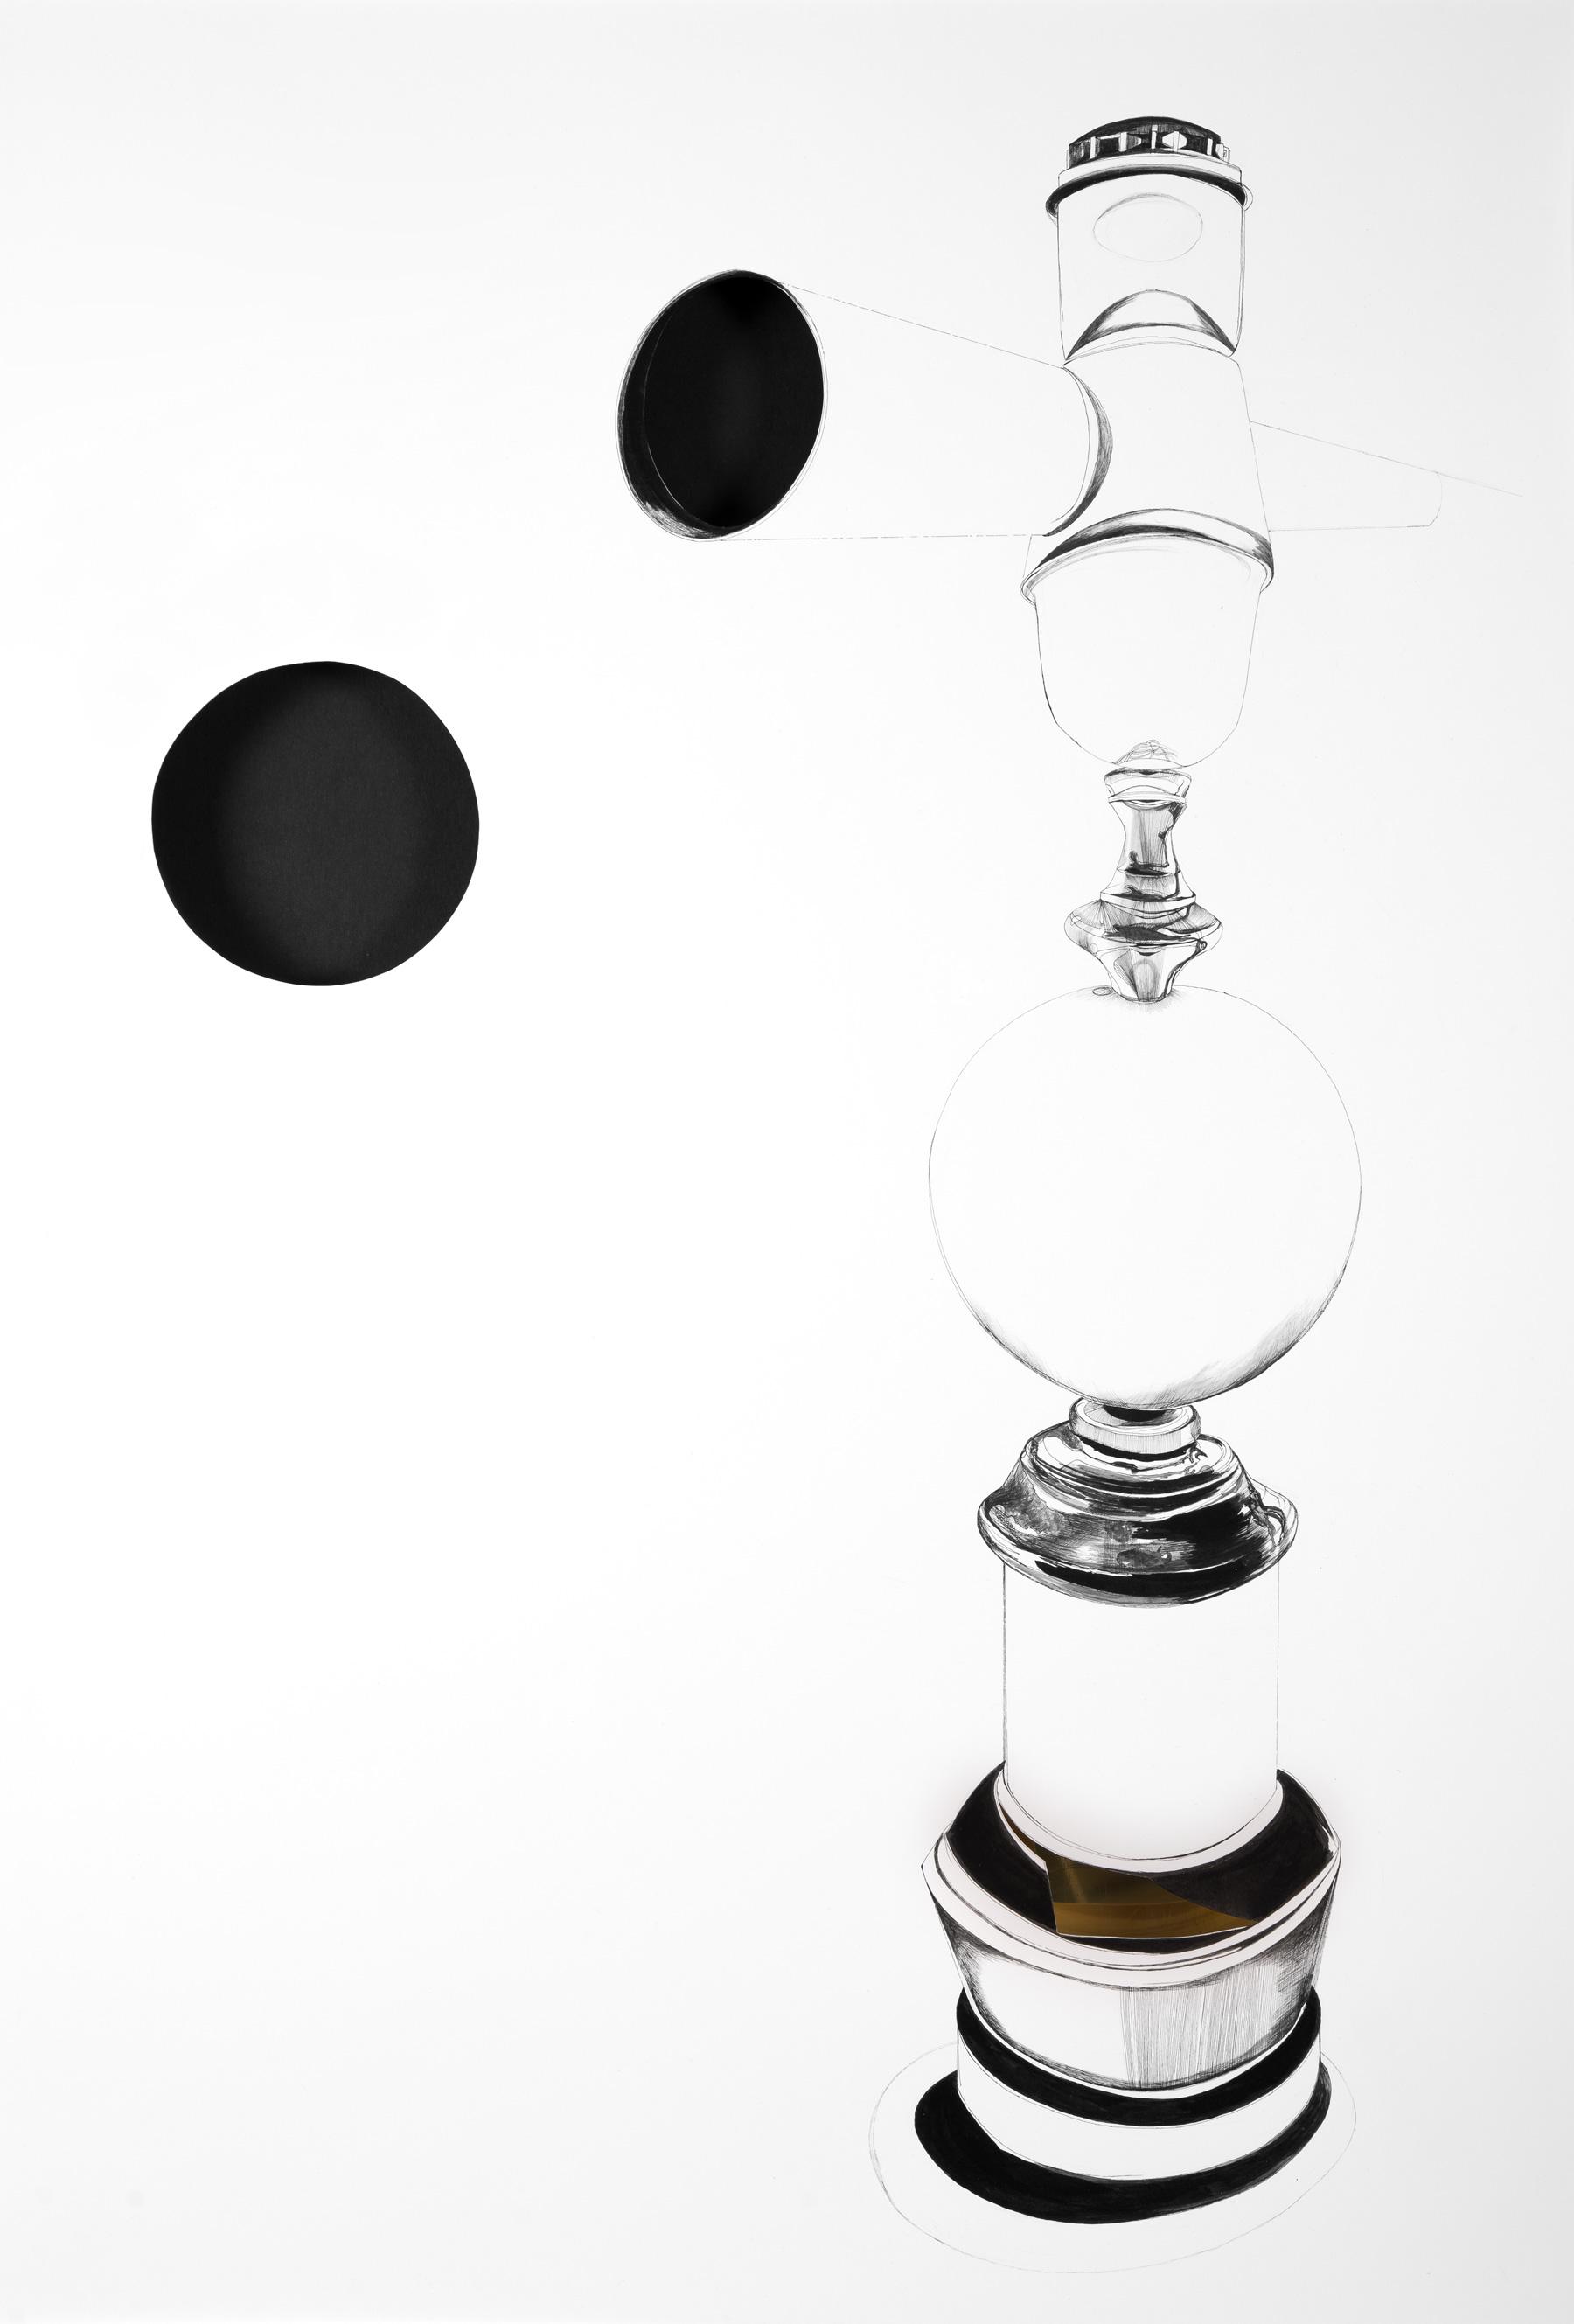 Nina Annabelle Märkl | Reflections 3 | Ink on paper Cut Outs black paper brass | 70 x 50 x 3 cm | 2014